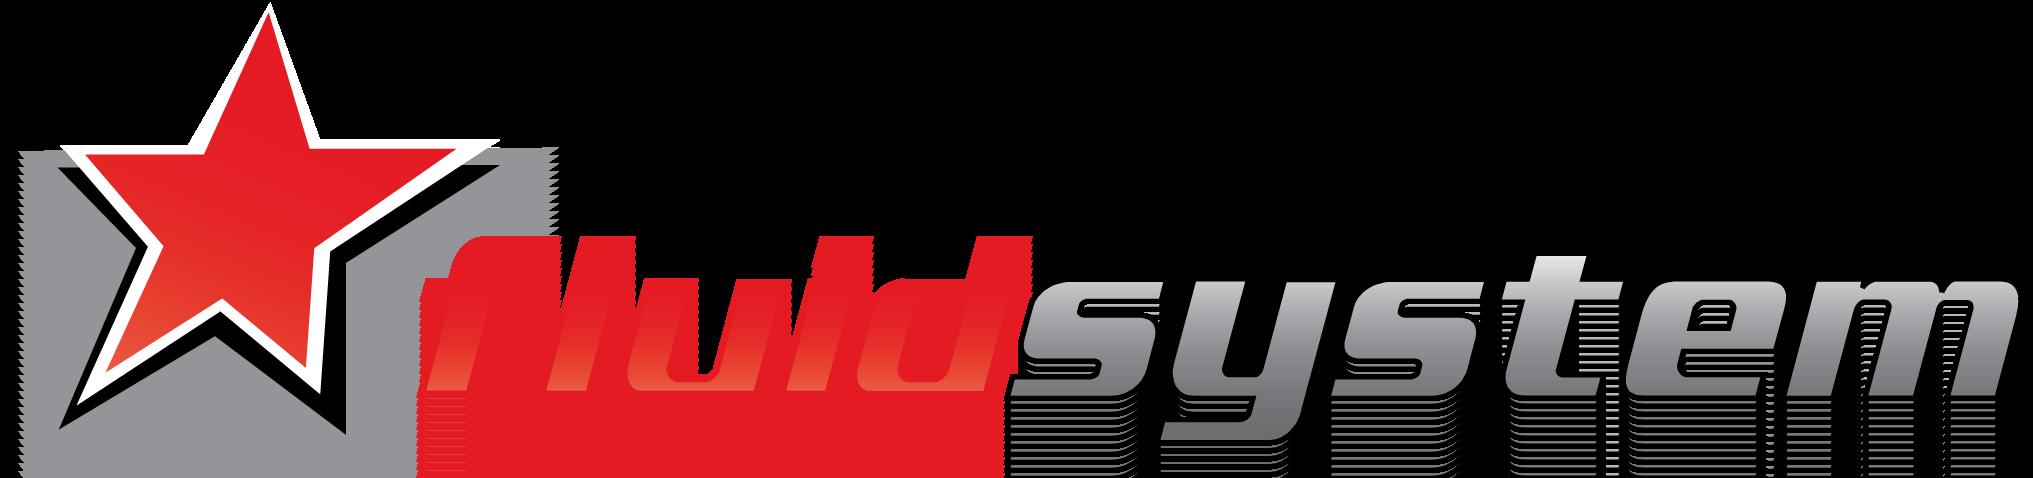 Logo Fluid System, S.L.